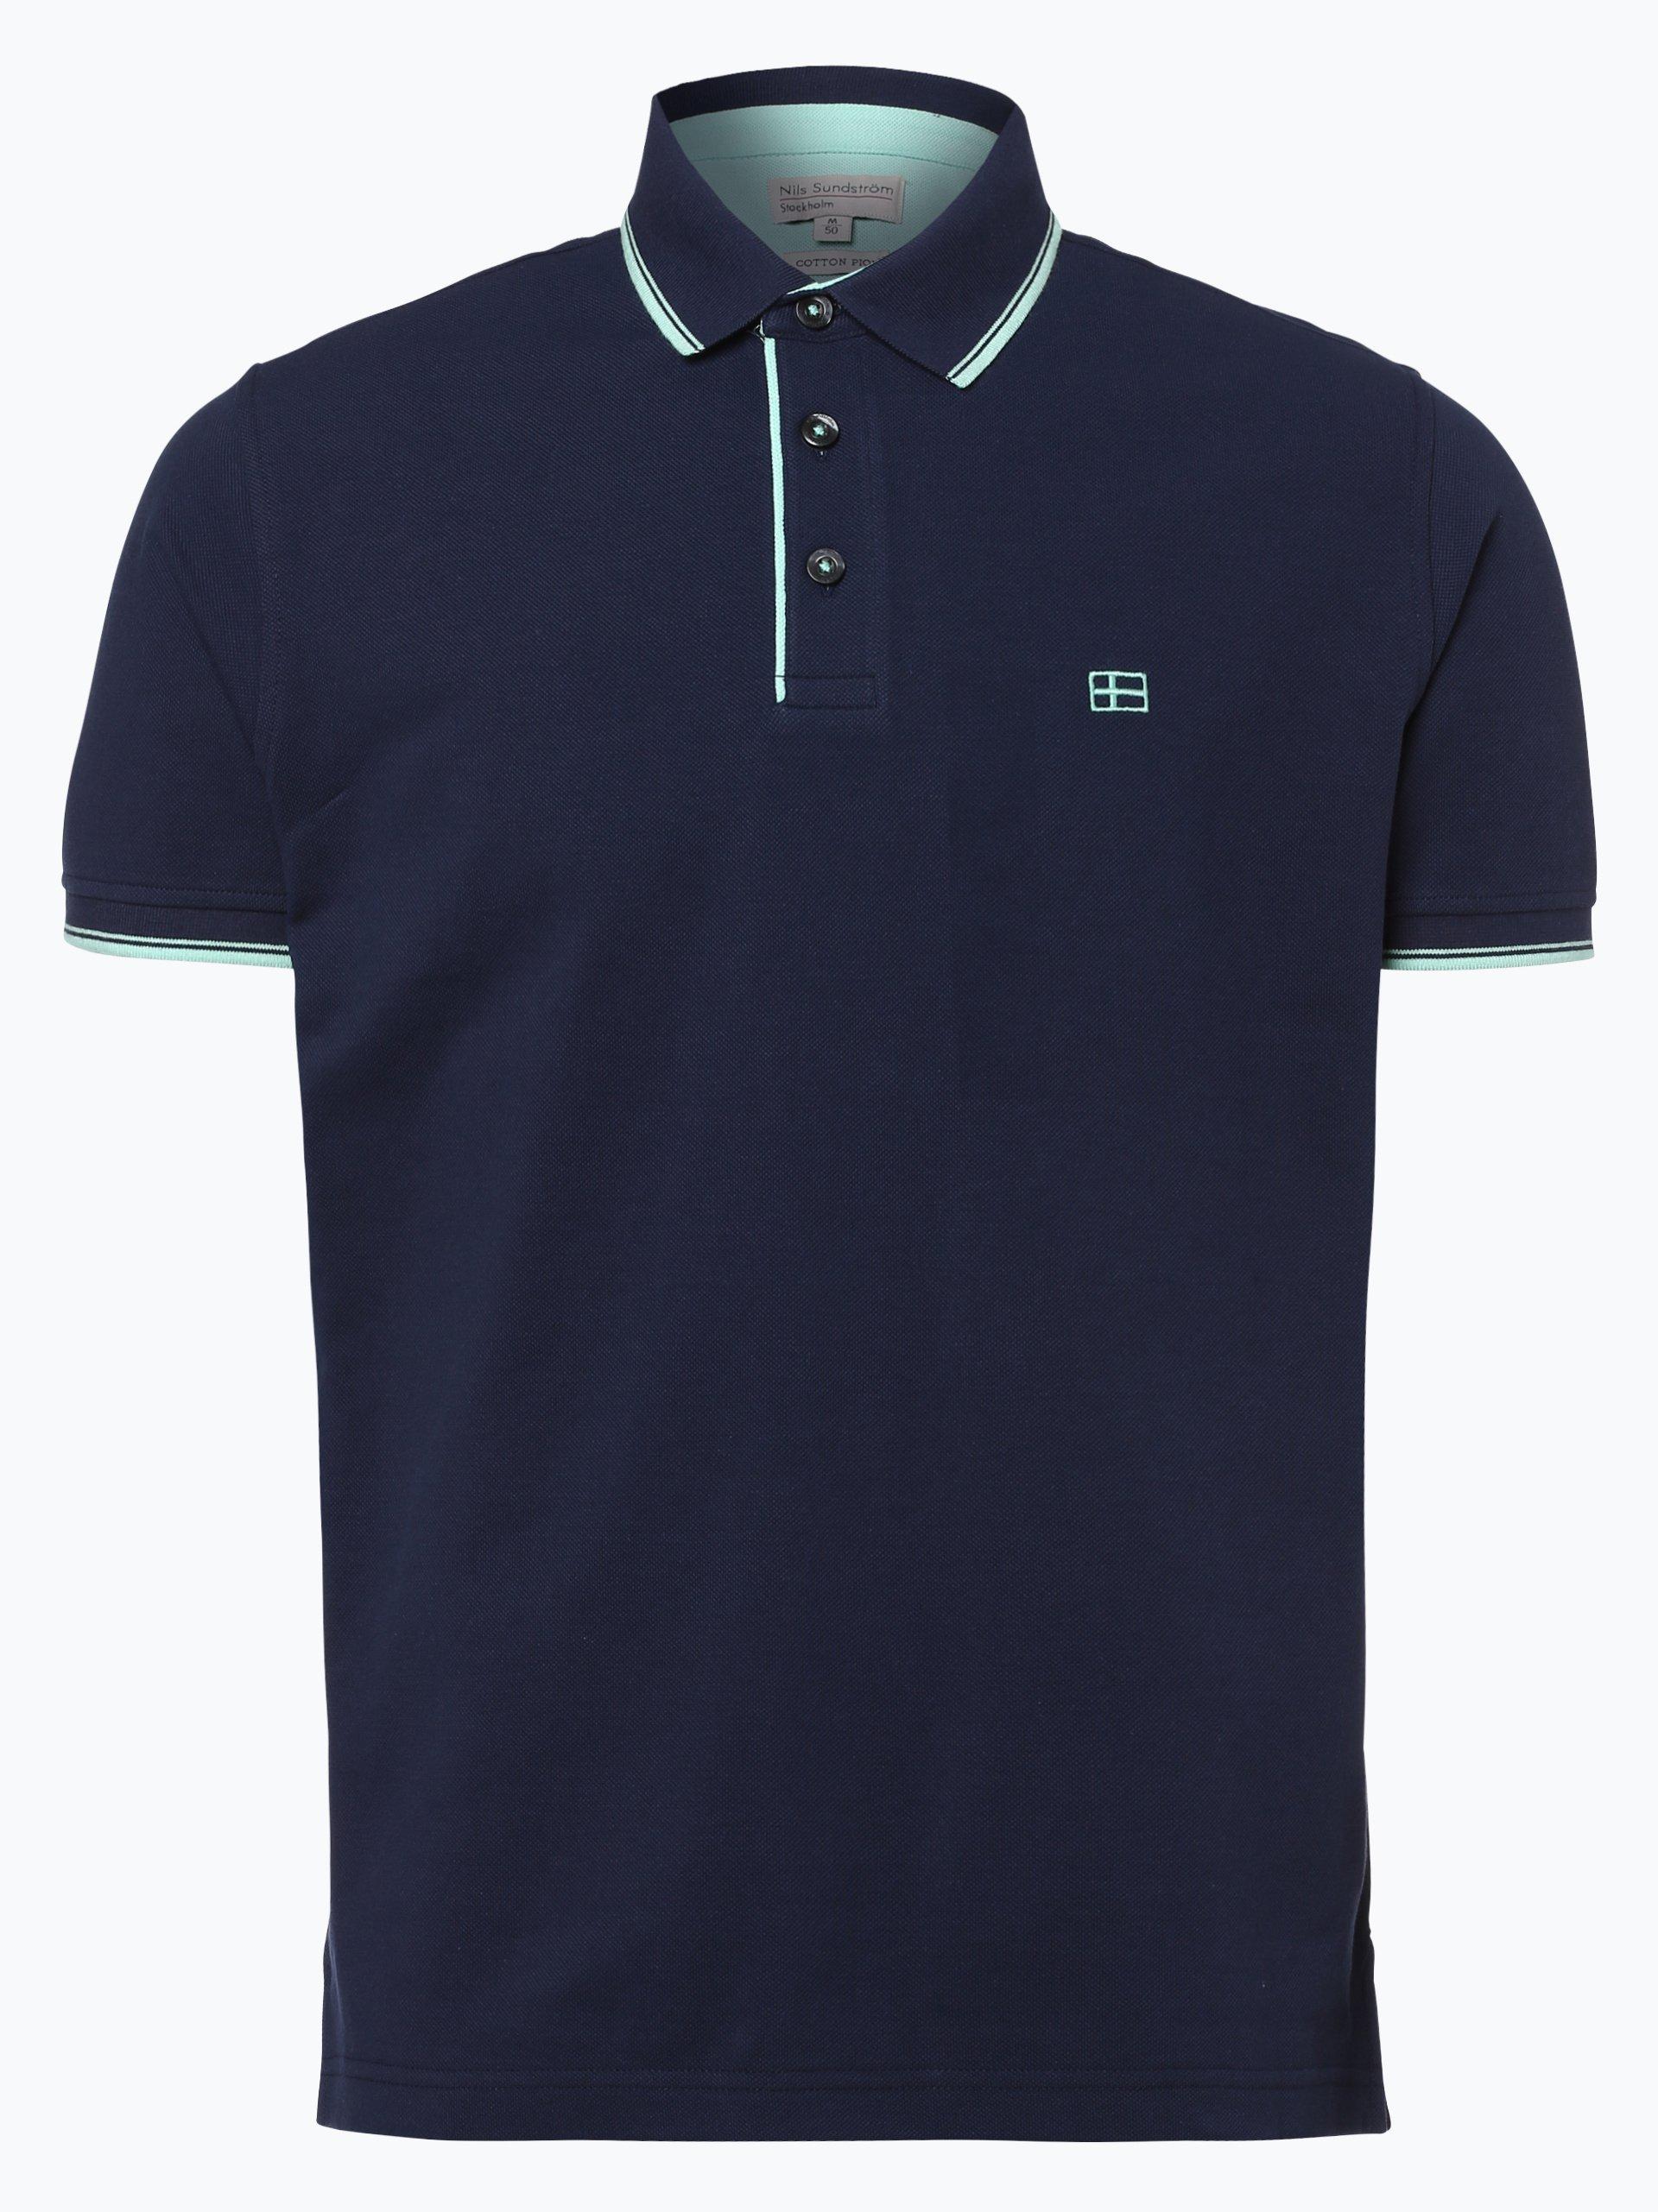 Nils Sundström Męska koszulka polo